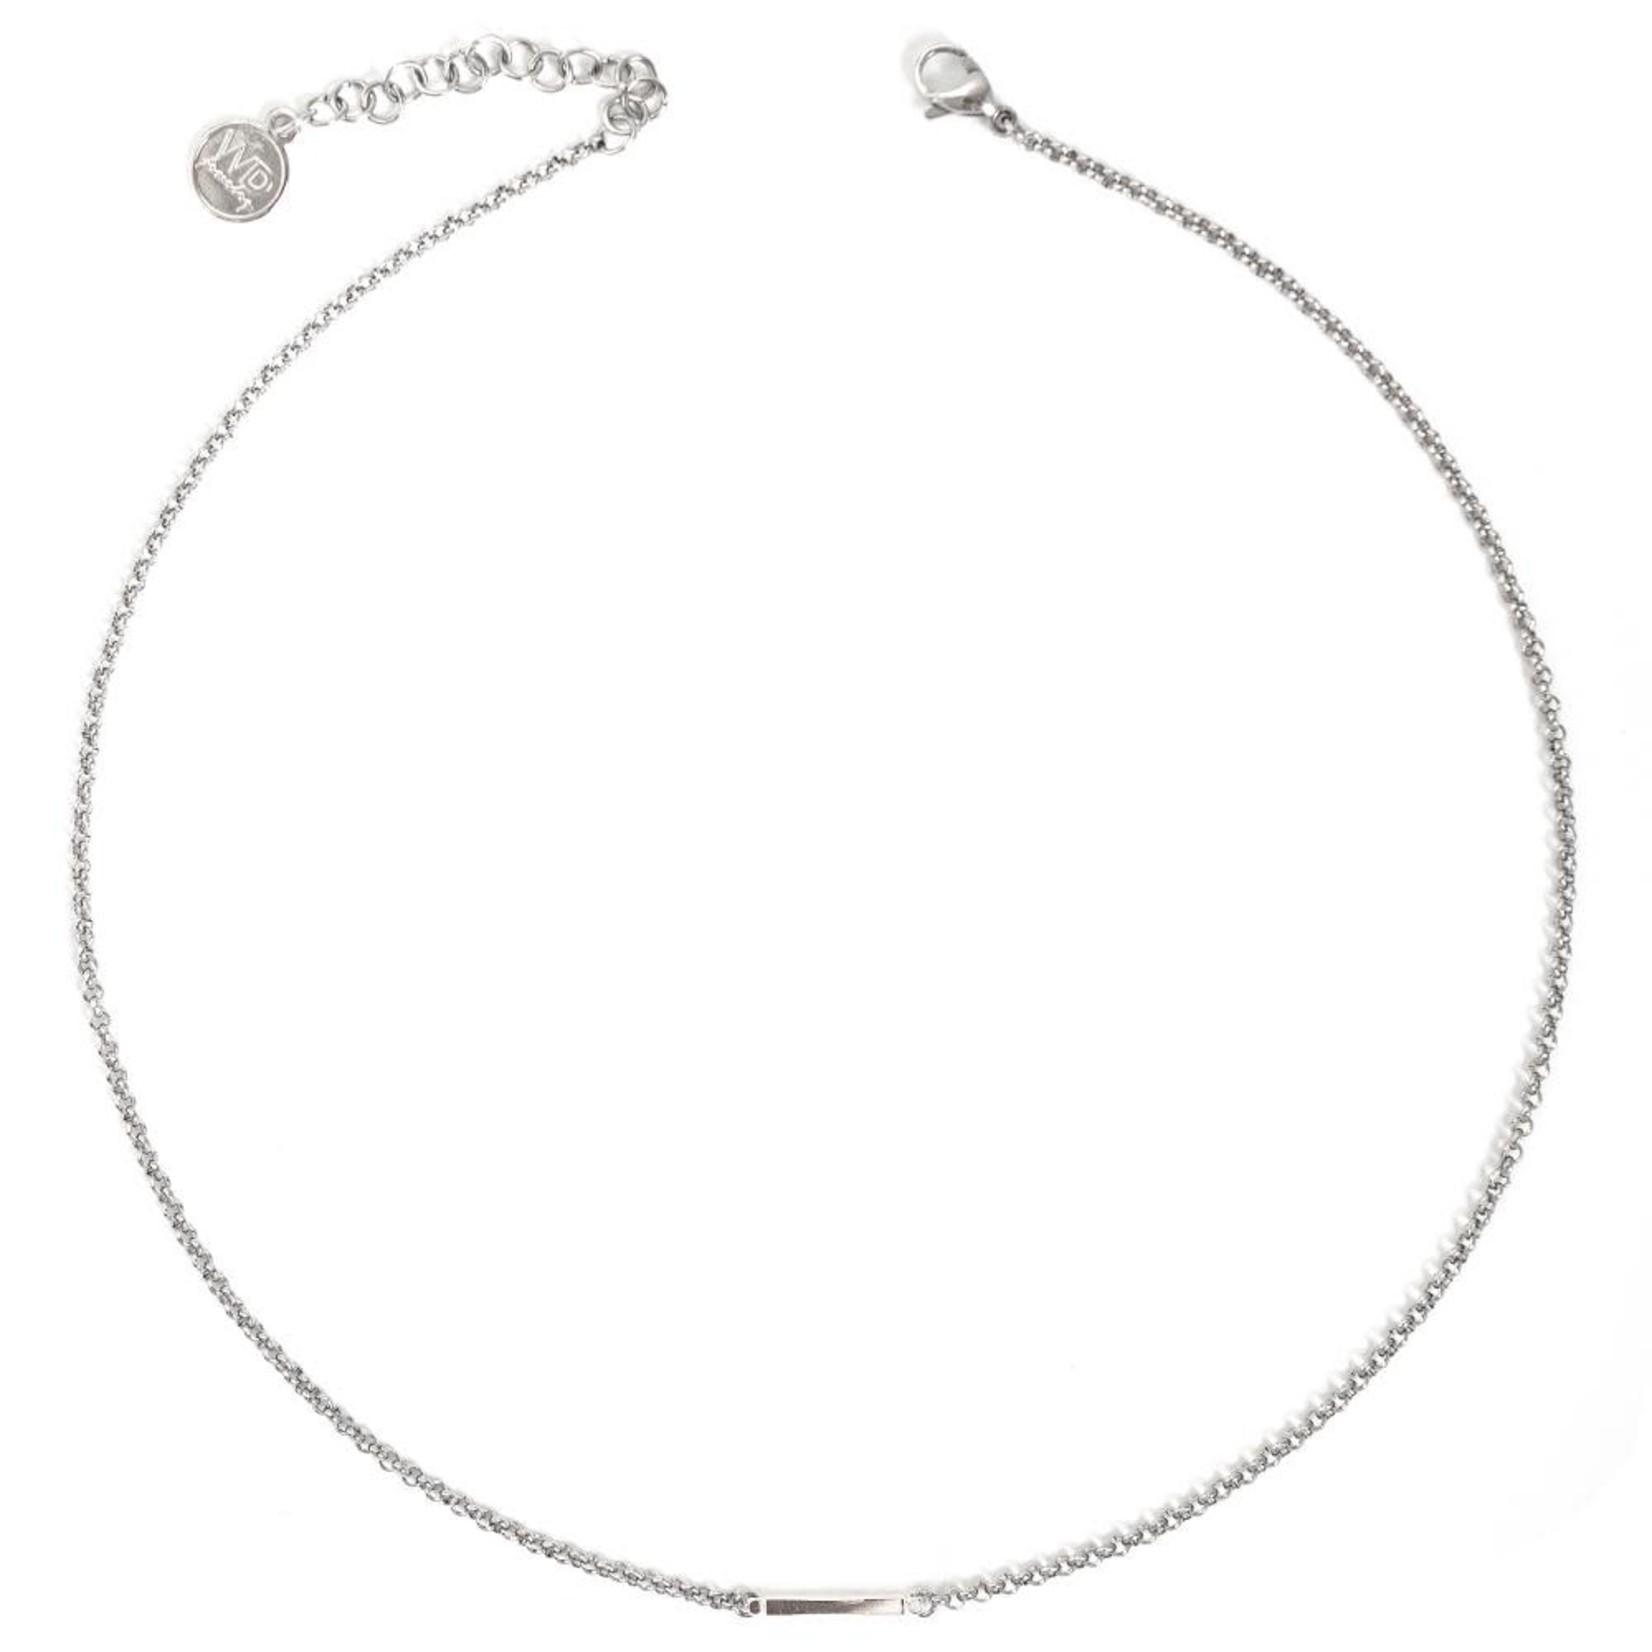 Welldunn jewelry Welldunn collier AXELLE argent